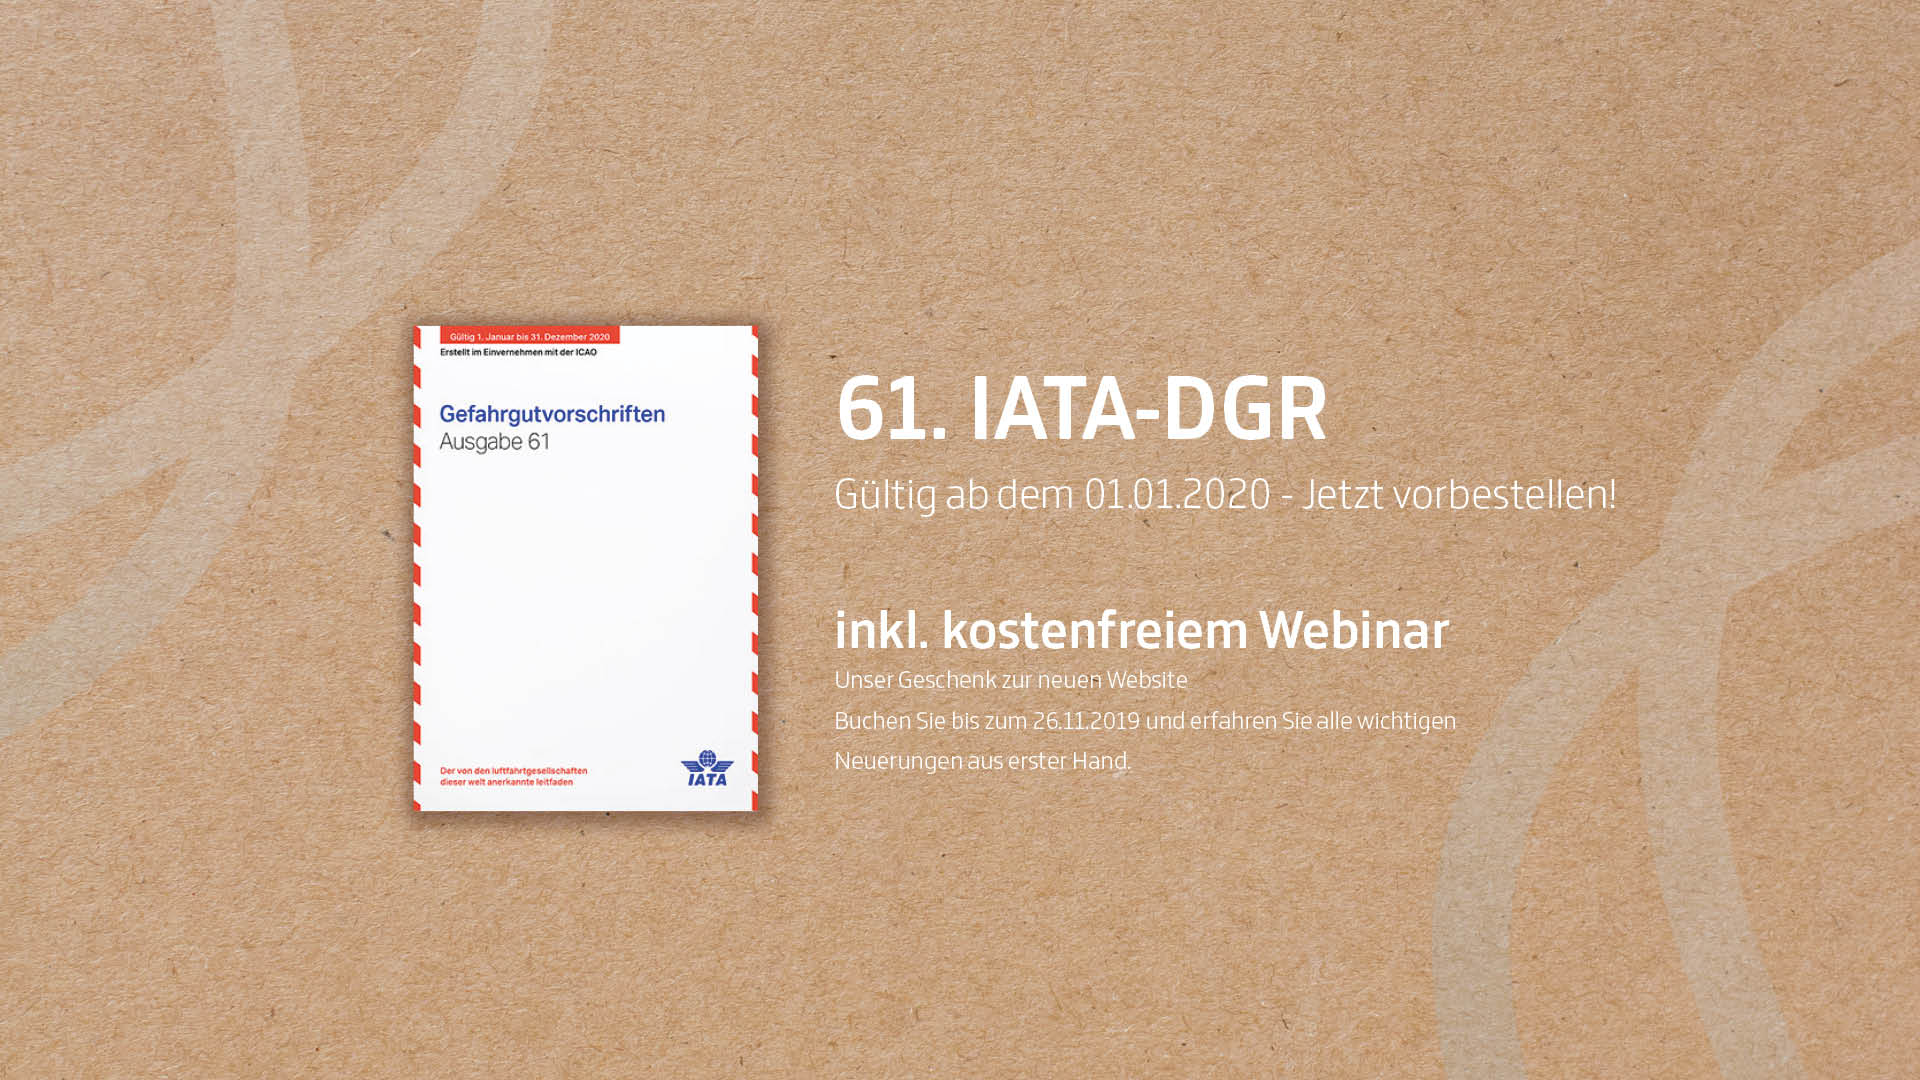 IATA DGR Gefahrgutvorschriften 2020